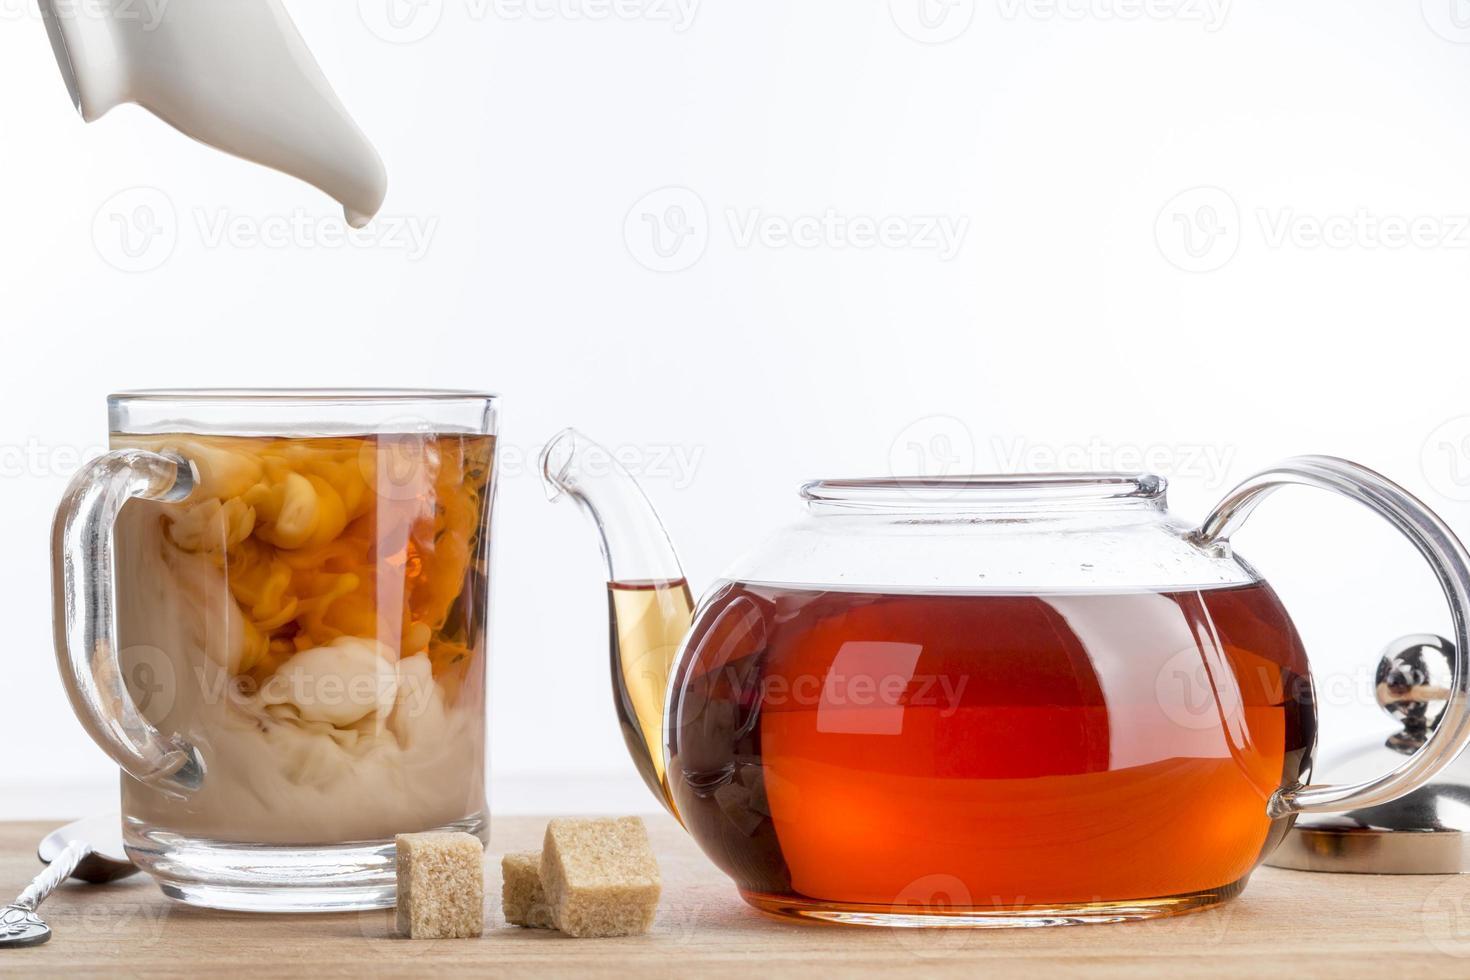 upplös mjölk i en kopp svart te. foto